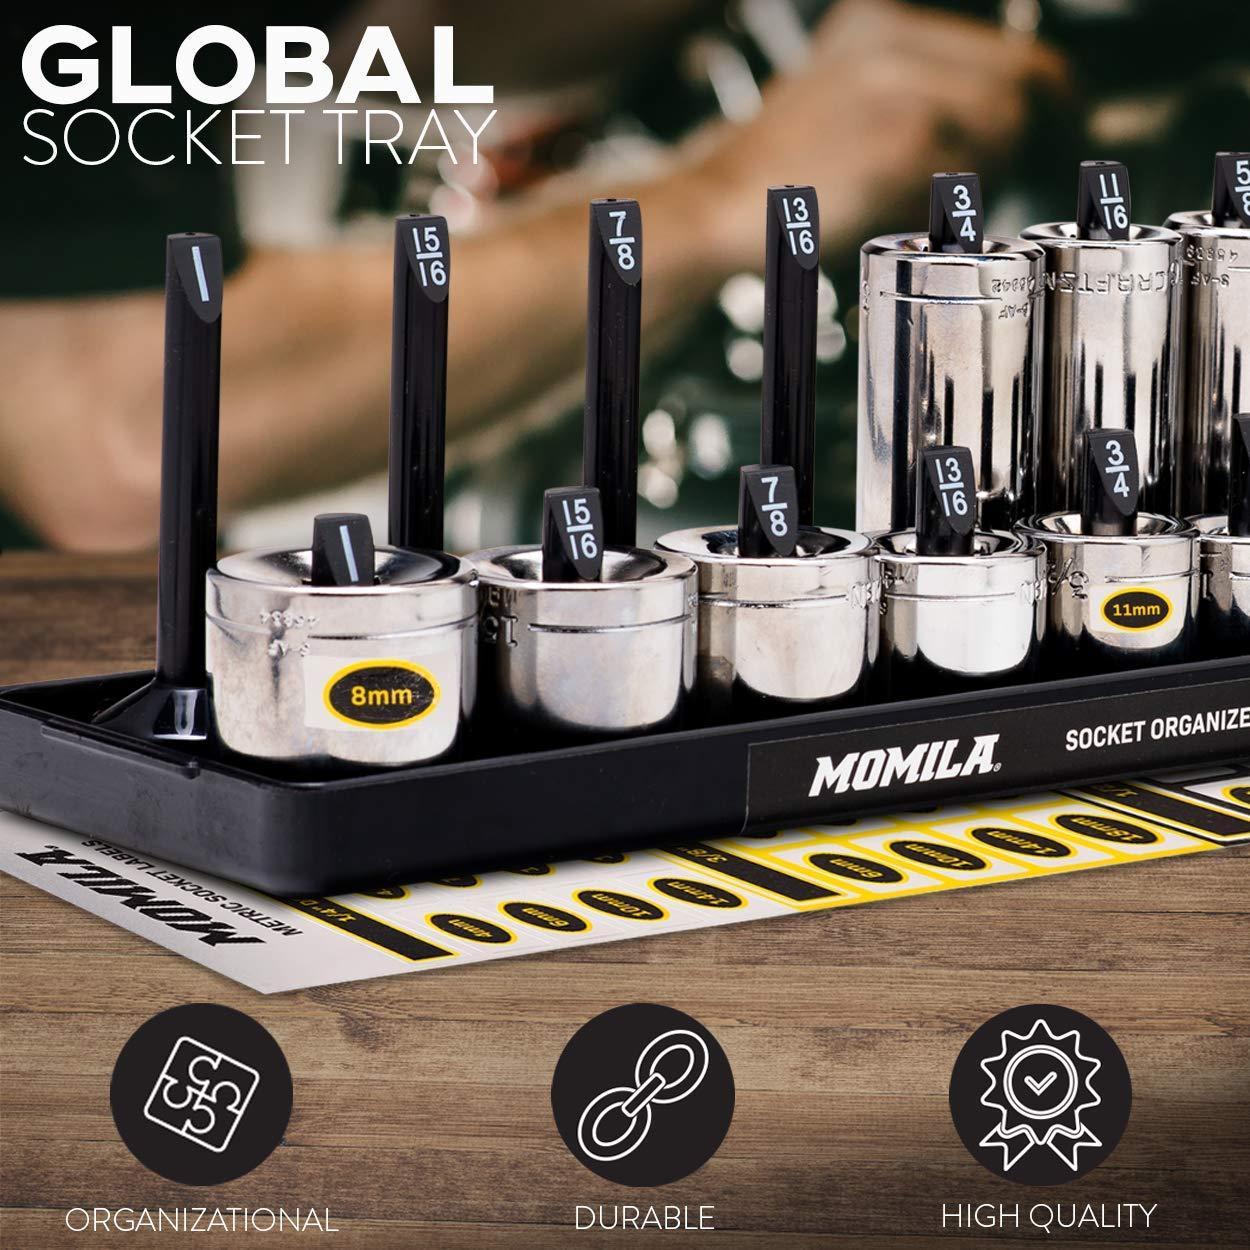 Socket Organizer Trays - 6 Piece Socket Tray Set Black SAE & Yellow Metric | 1/4-Inch, 3/8-Inch & 1/2-Inch Drive Socket Holder | Premium Quality Tool Organizers by Momila (Image #1)